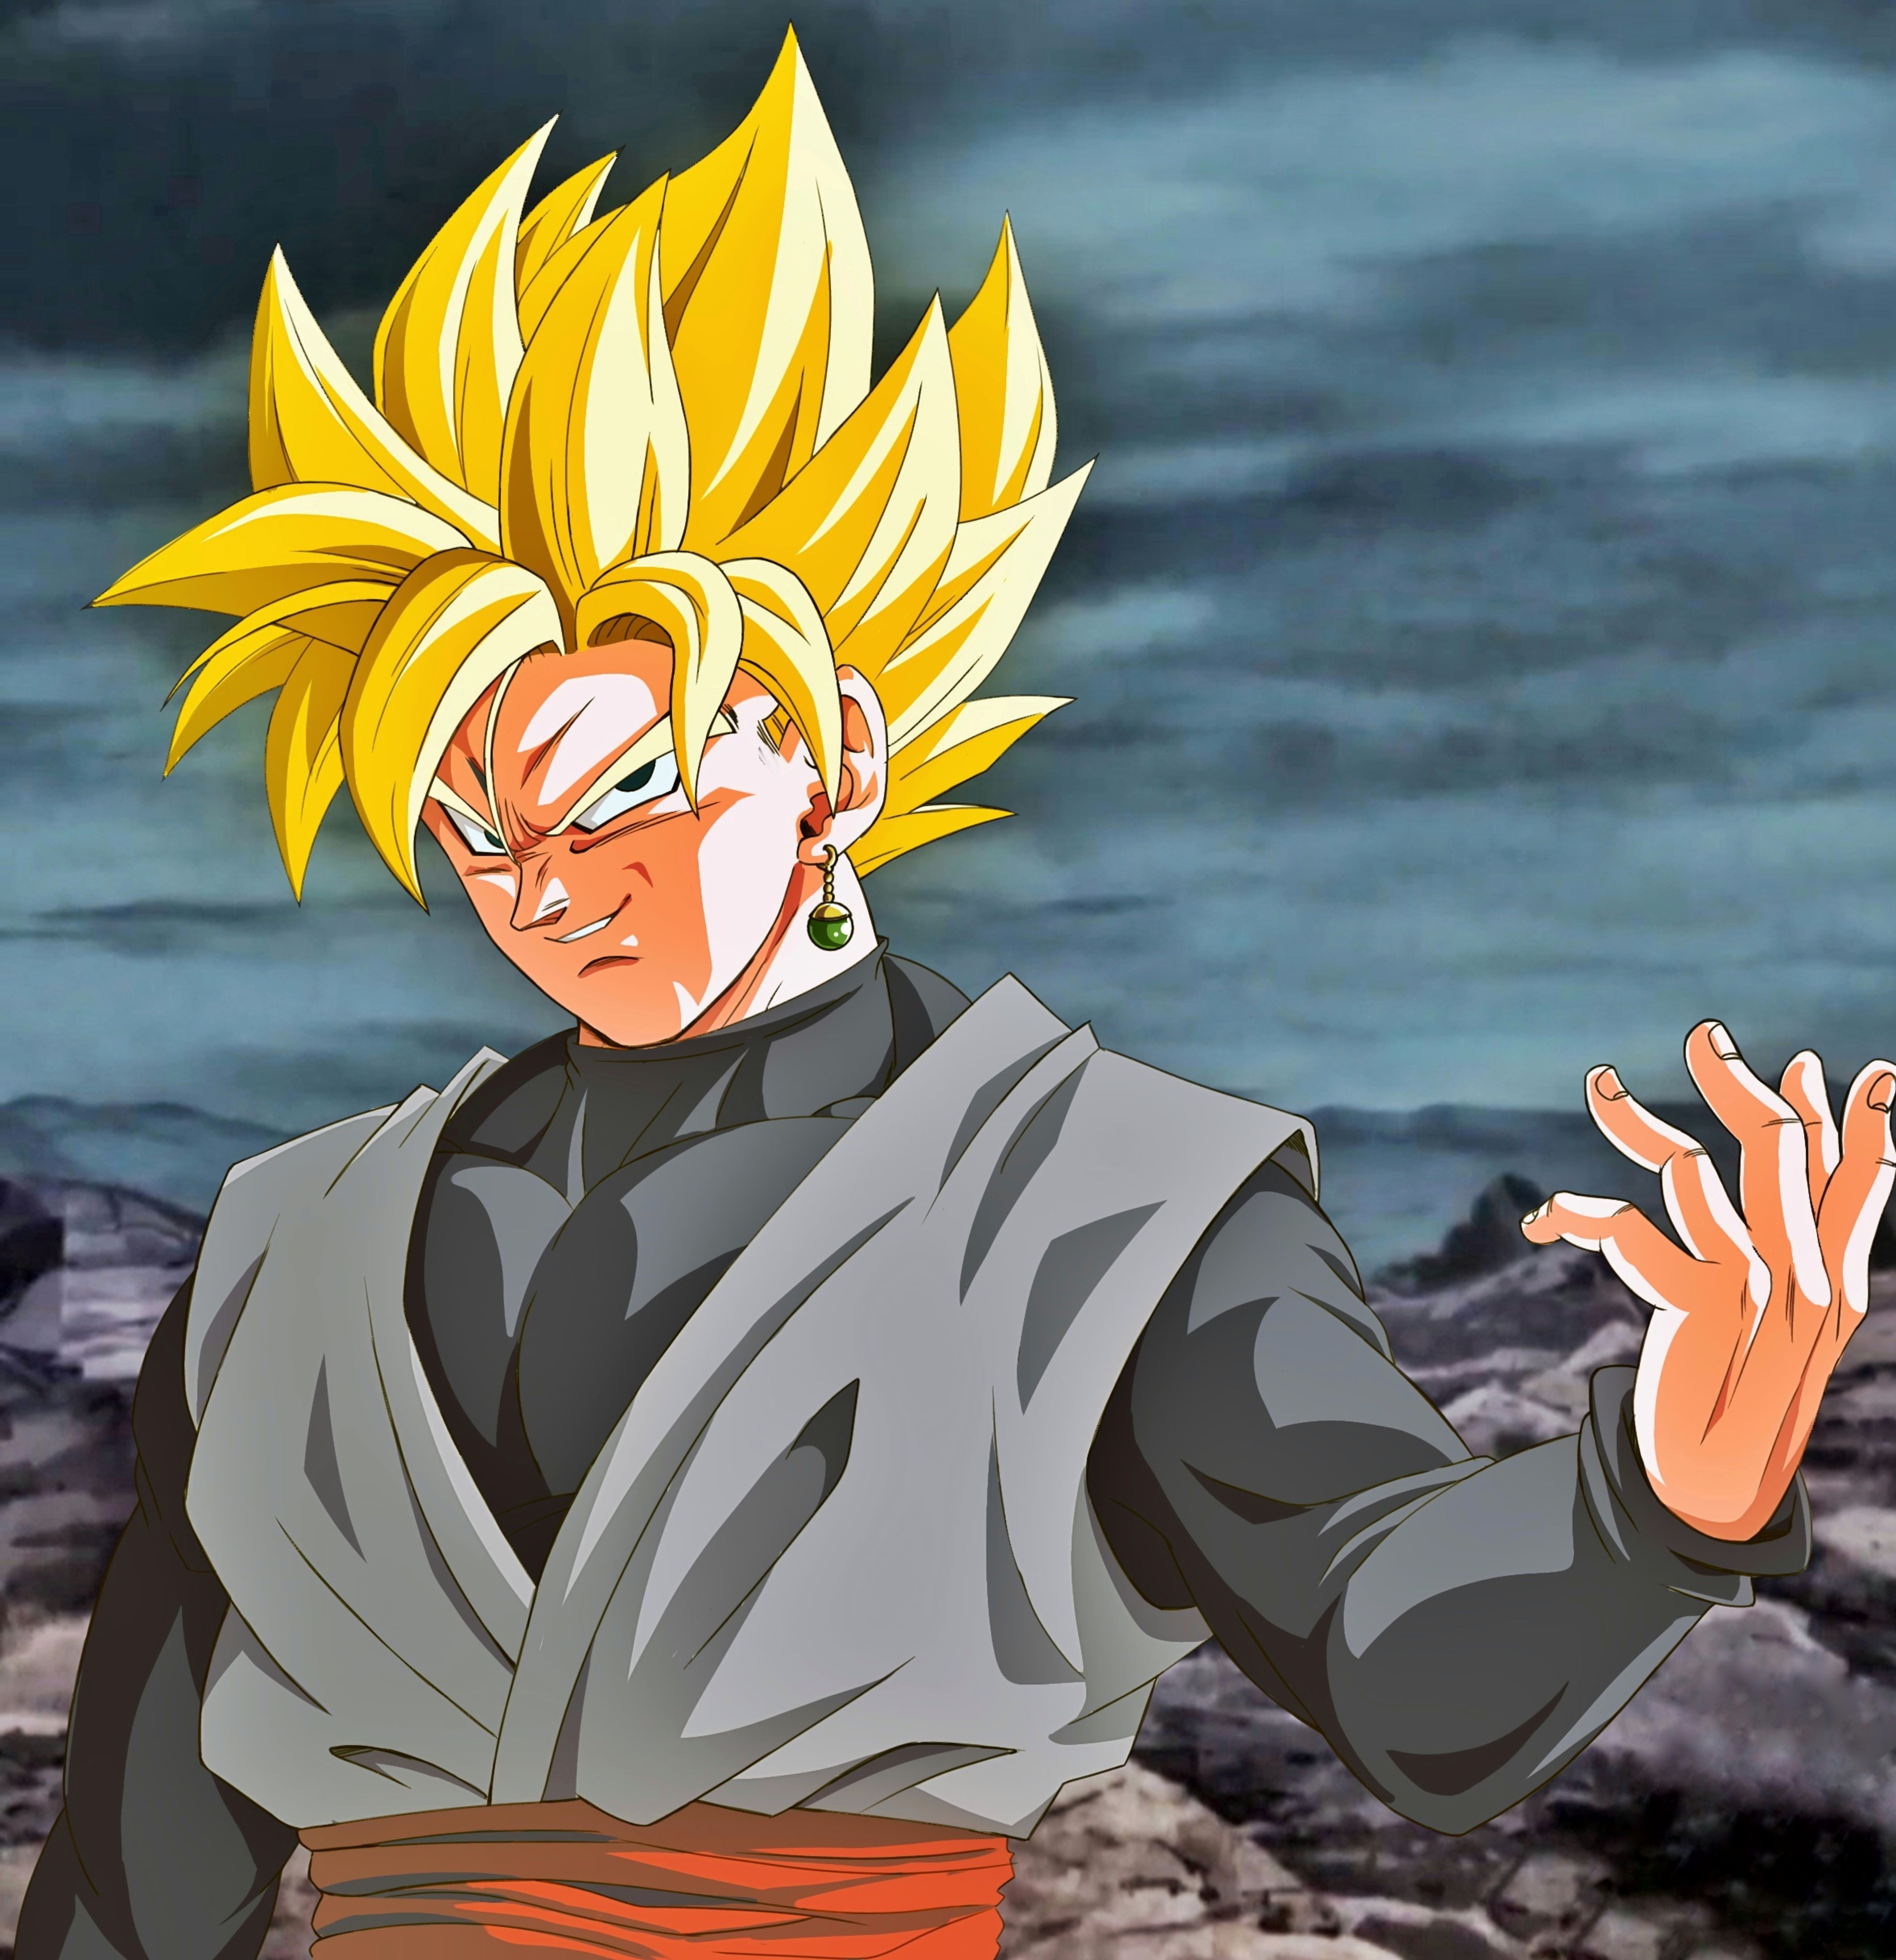 Black Goku Ssj Dragon Ball Image Dragon Ball Art Goku Black Ssj